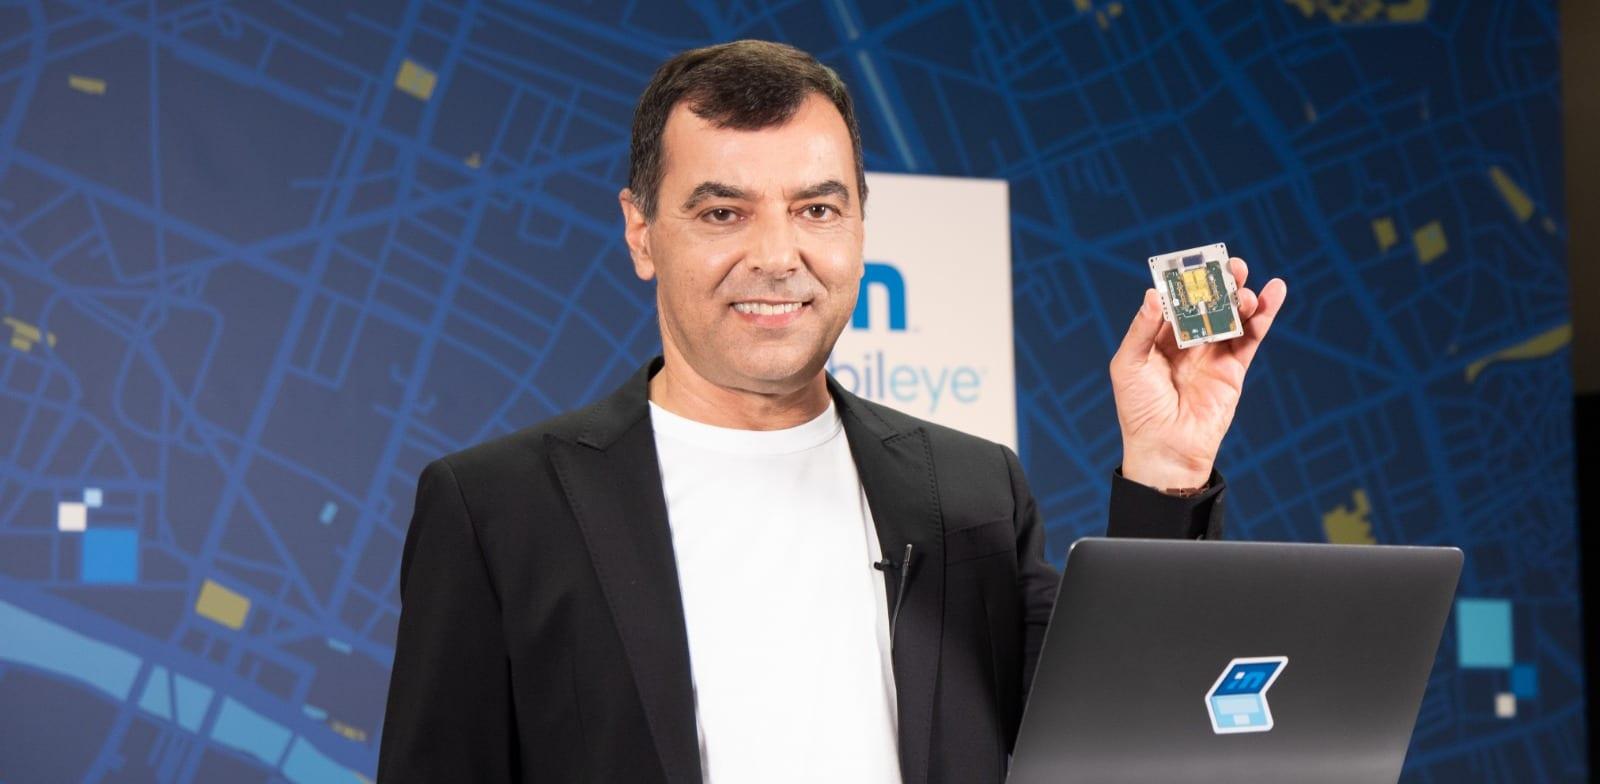 Amnon Shashua presents Mobileye's new radar chip credit: Mobileye